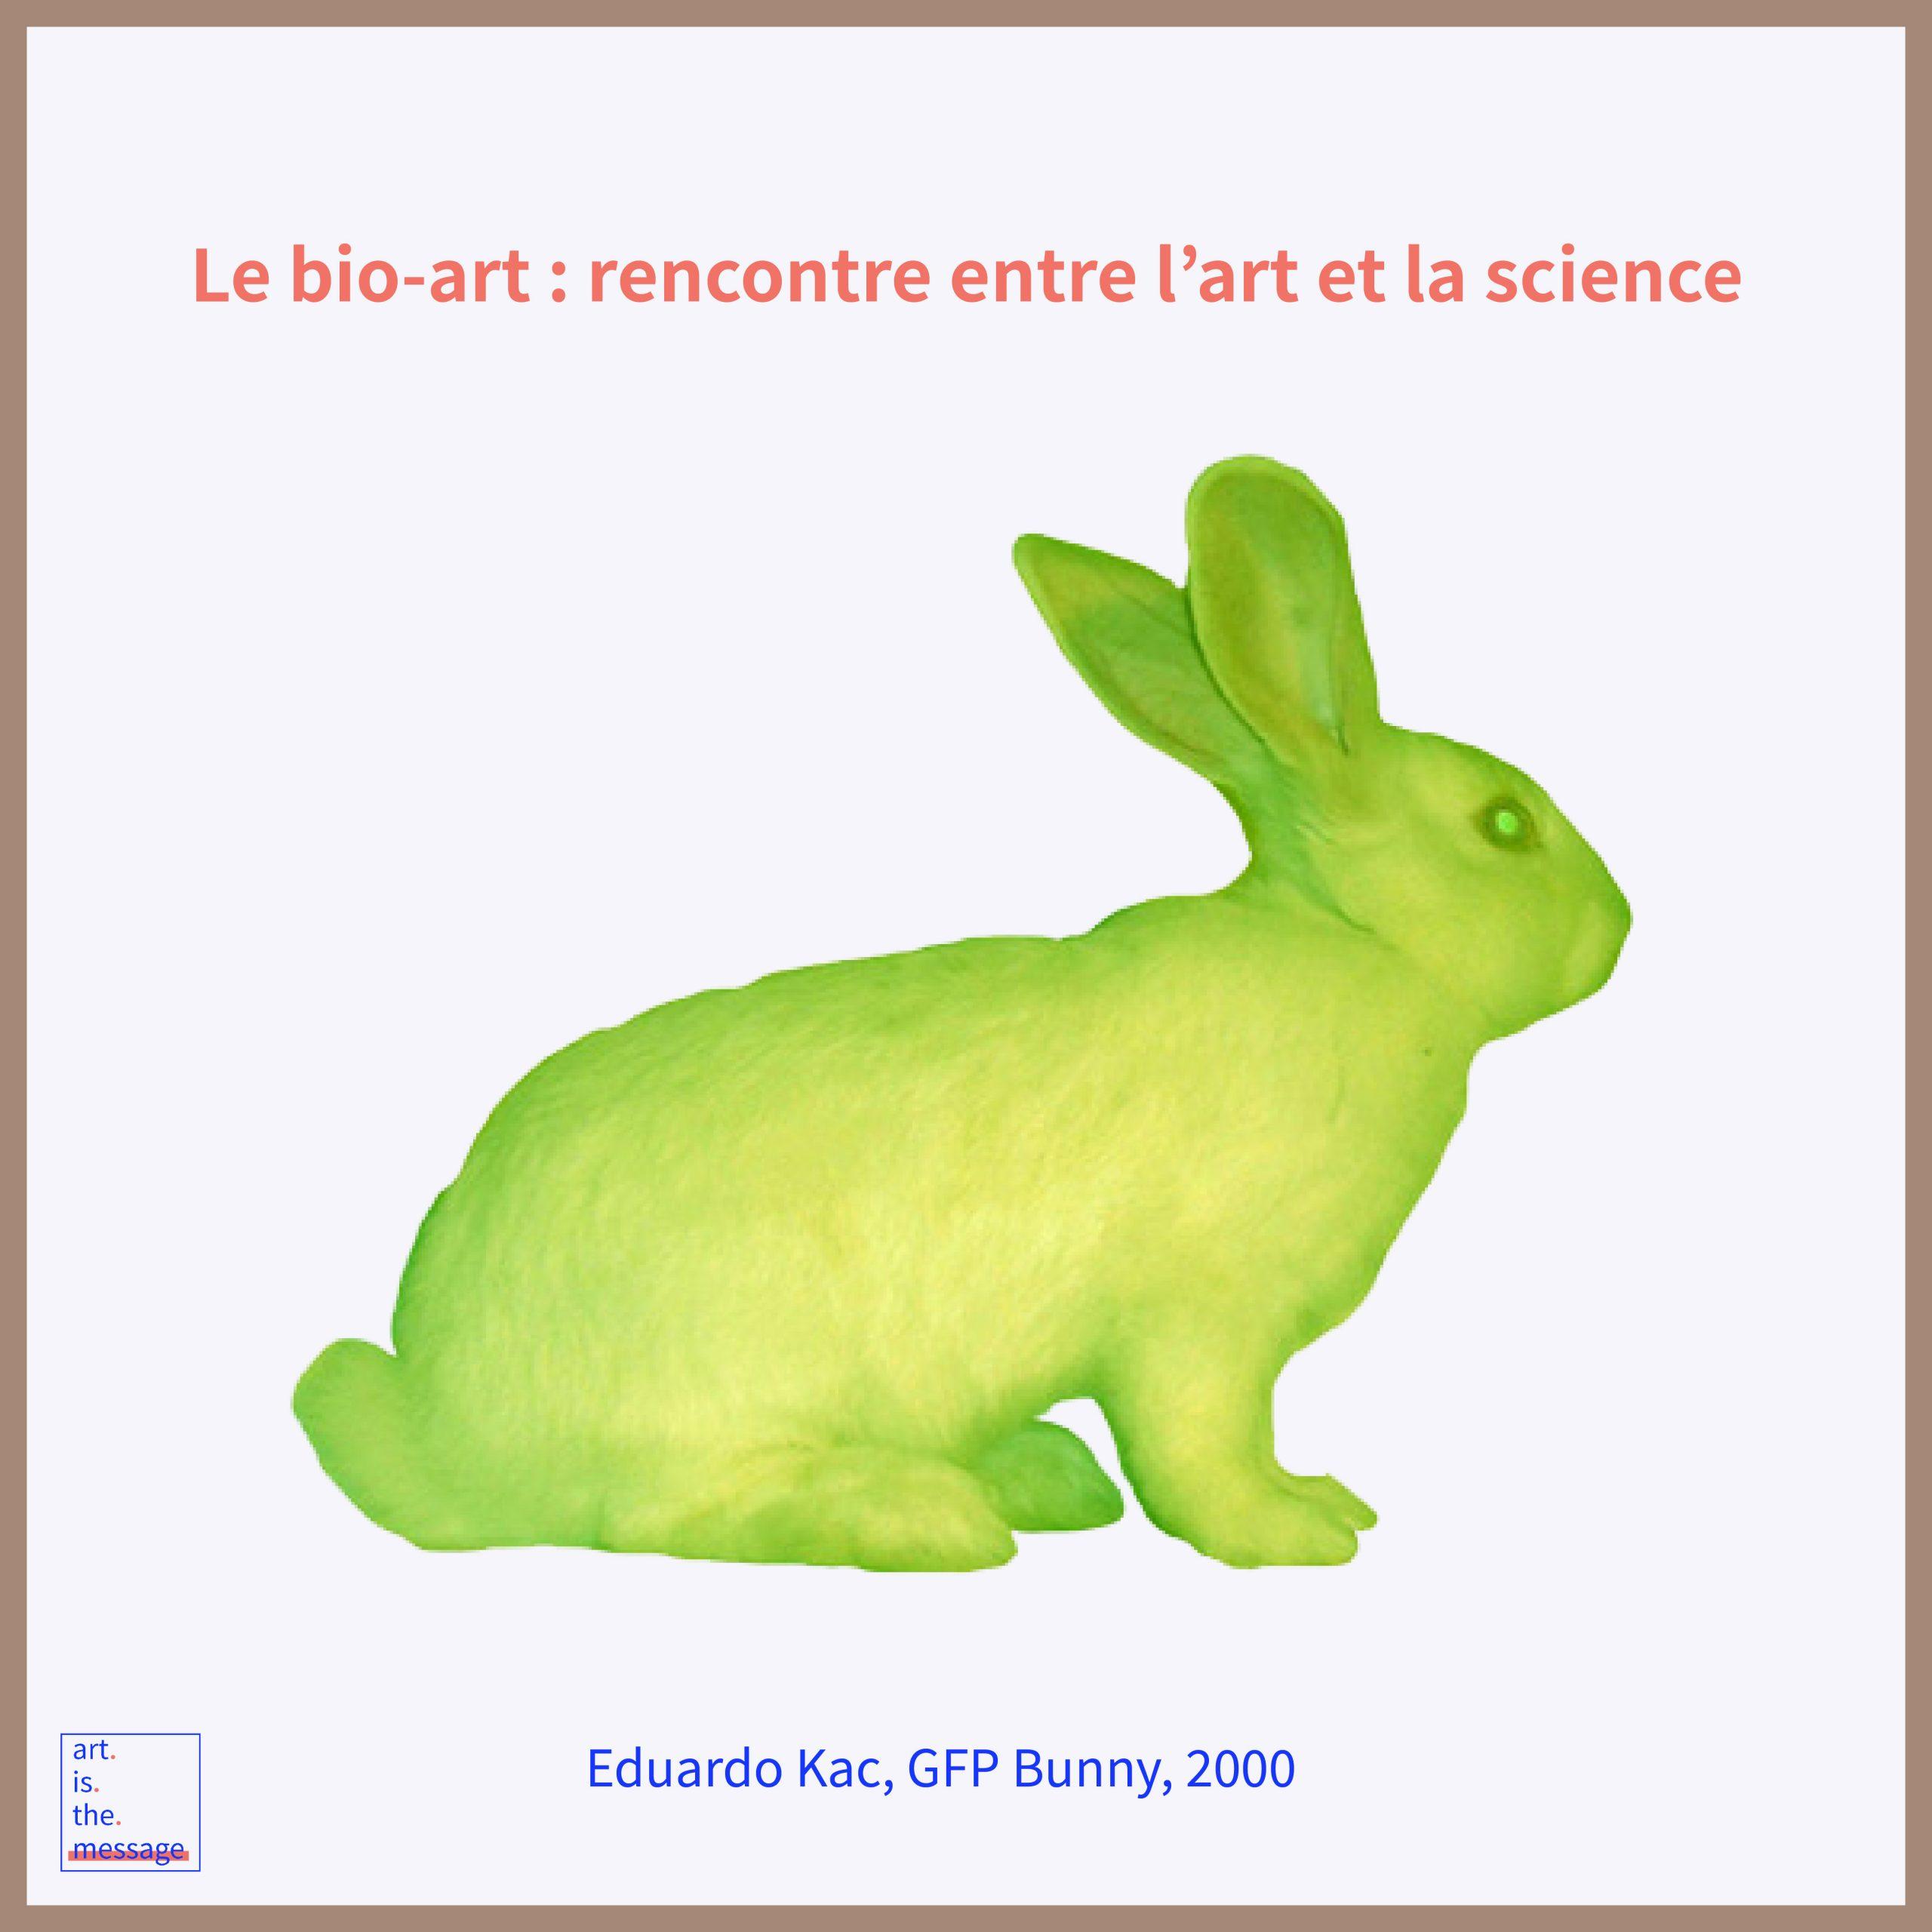 lapin fluorescent bio-art